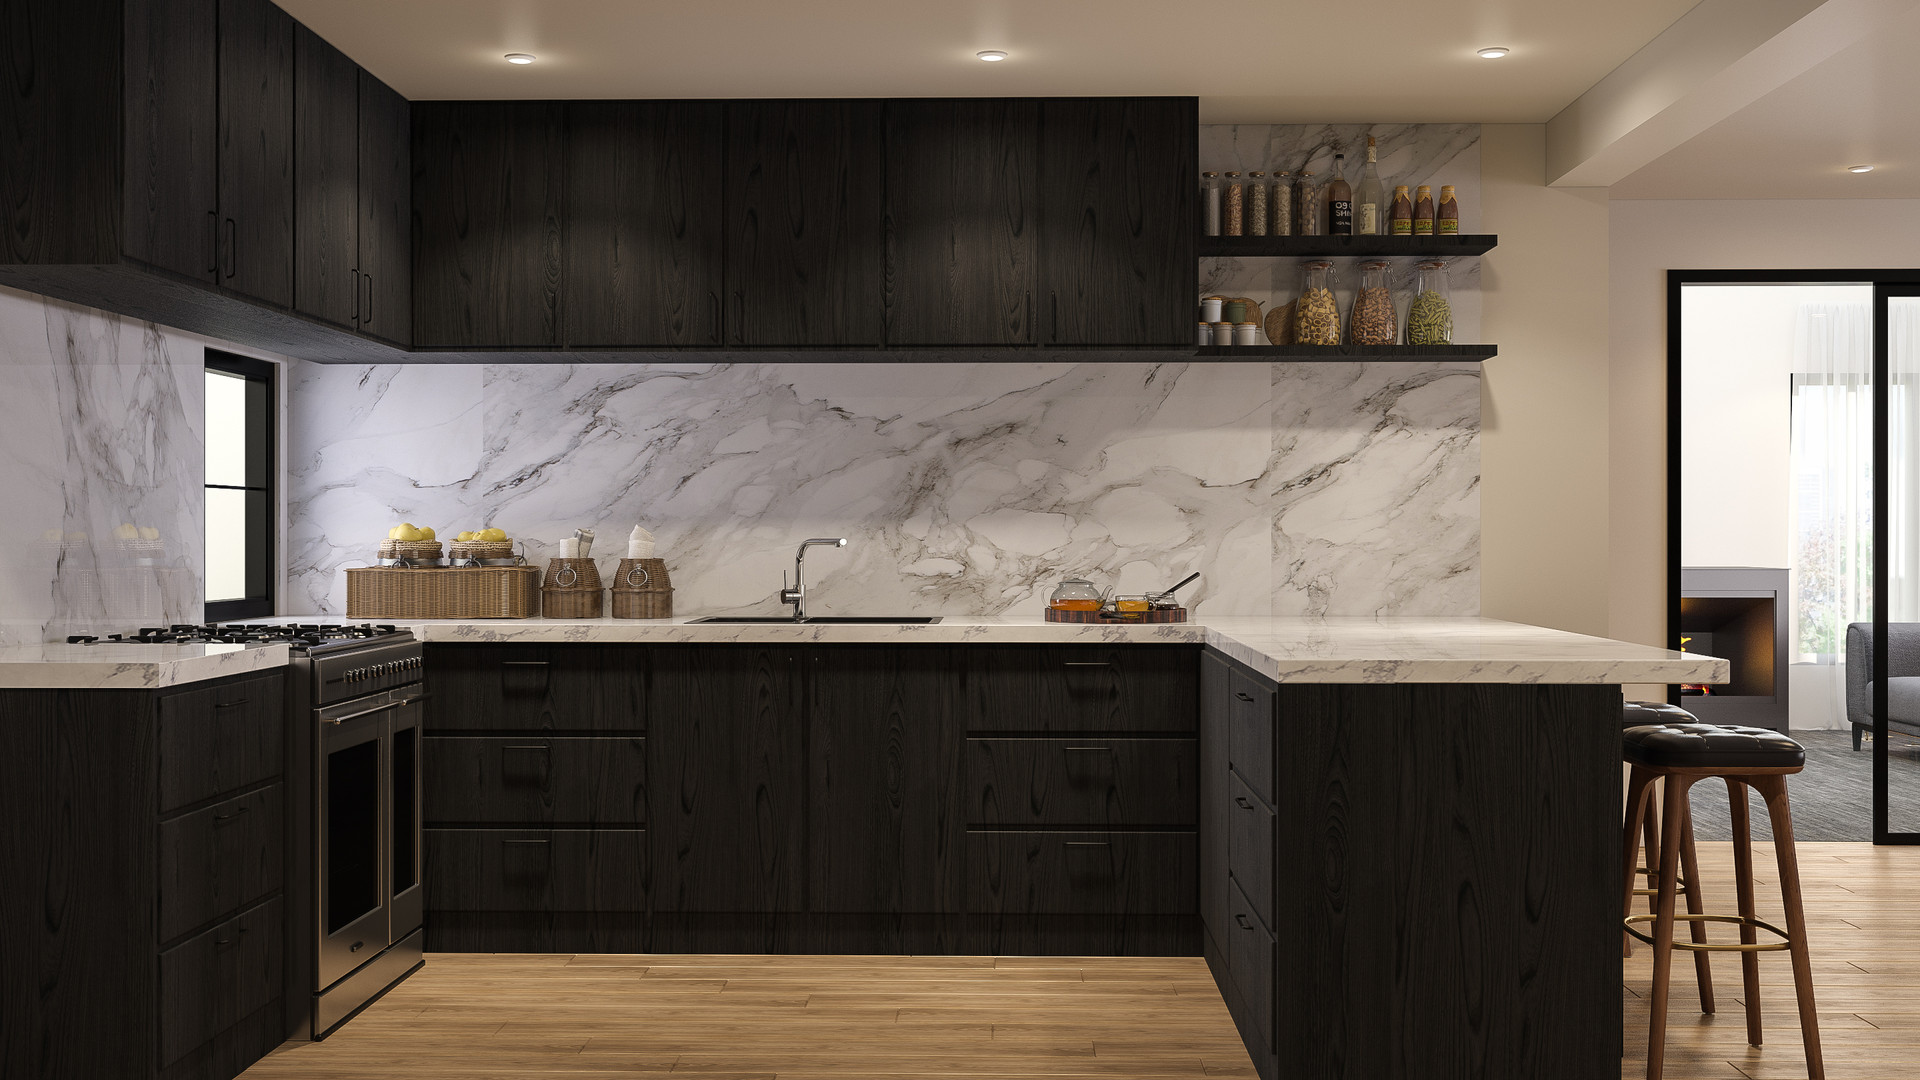 The Ellesmere kitchen